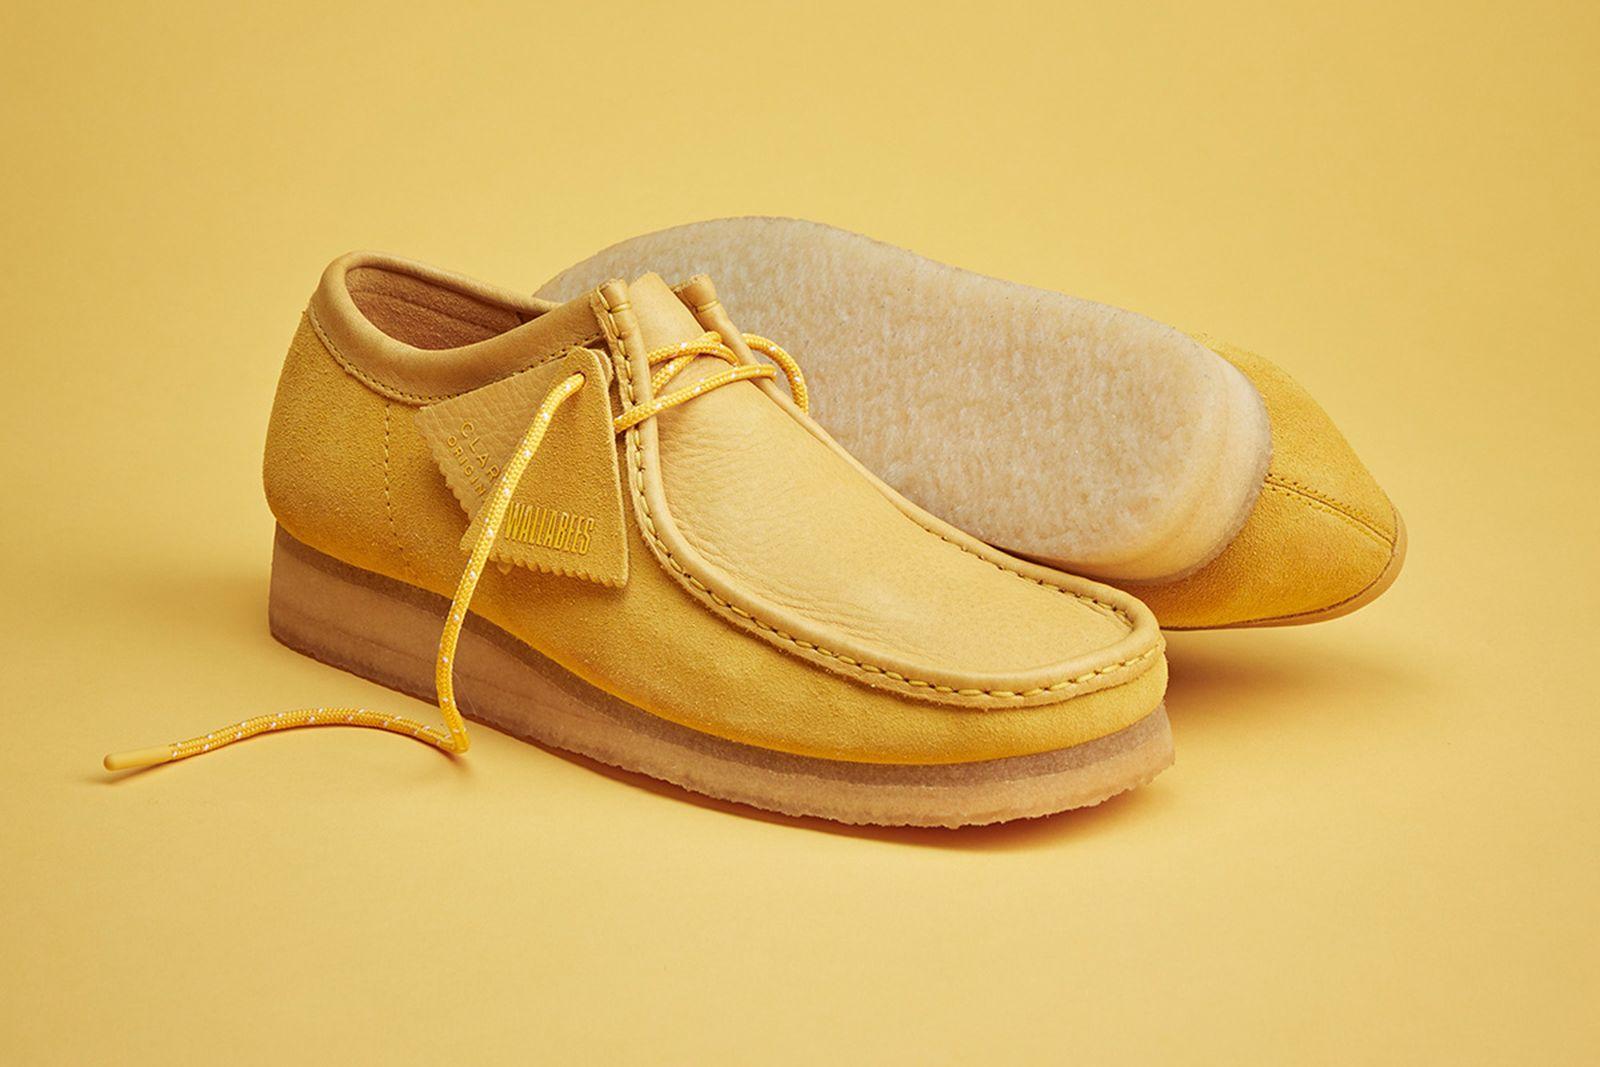 clarks-wallabee-low-yellow